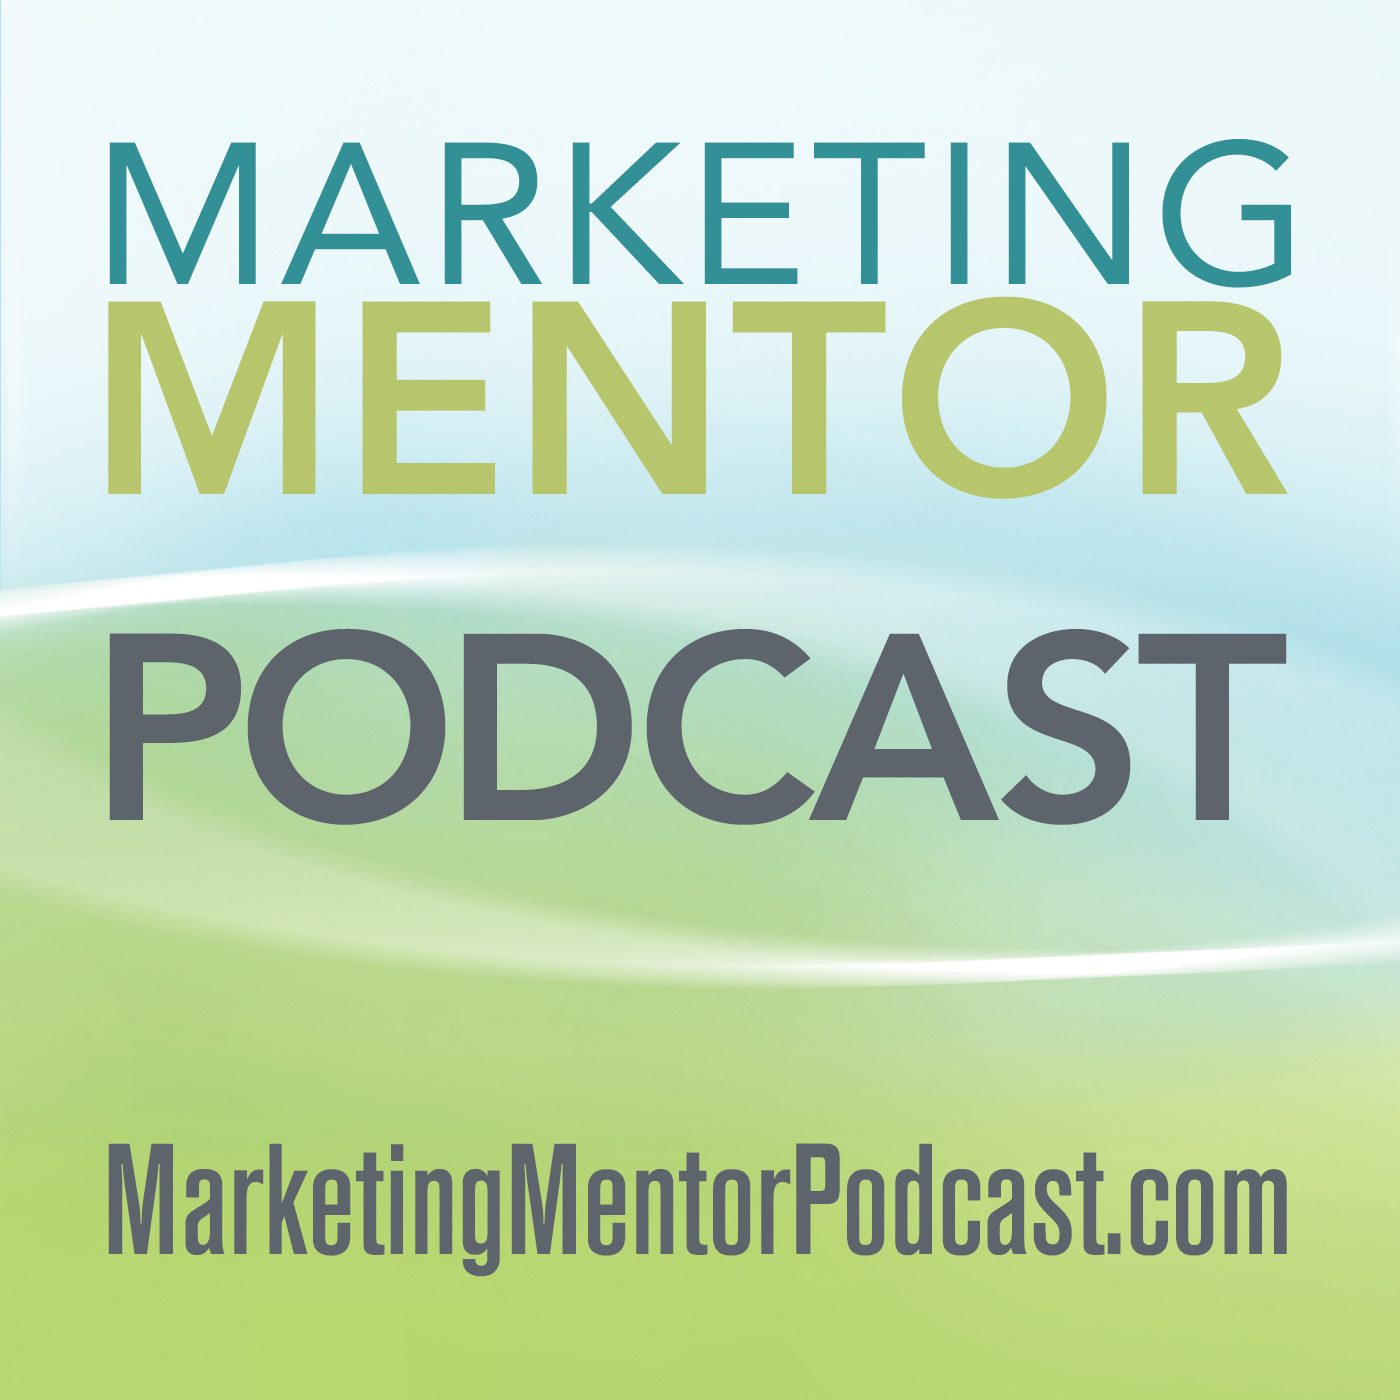 The Marketing Mentor Podcast show art